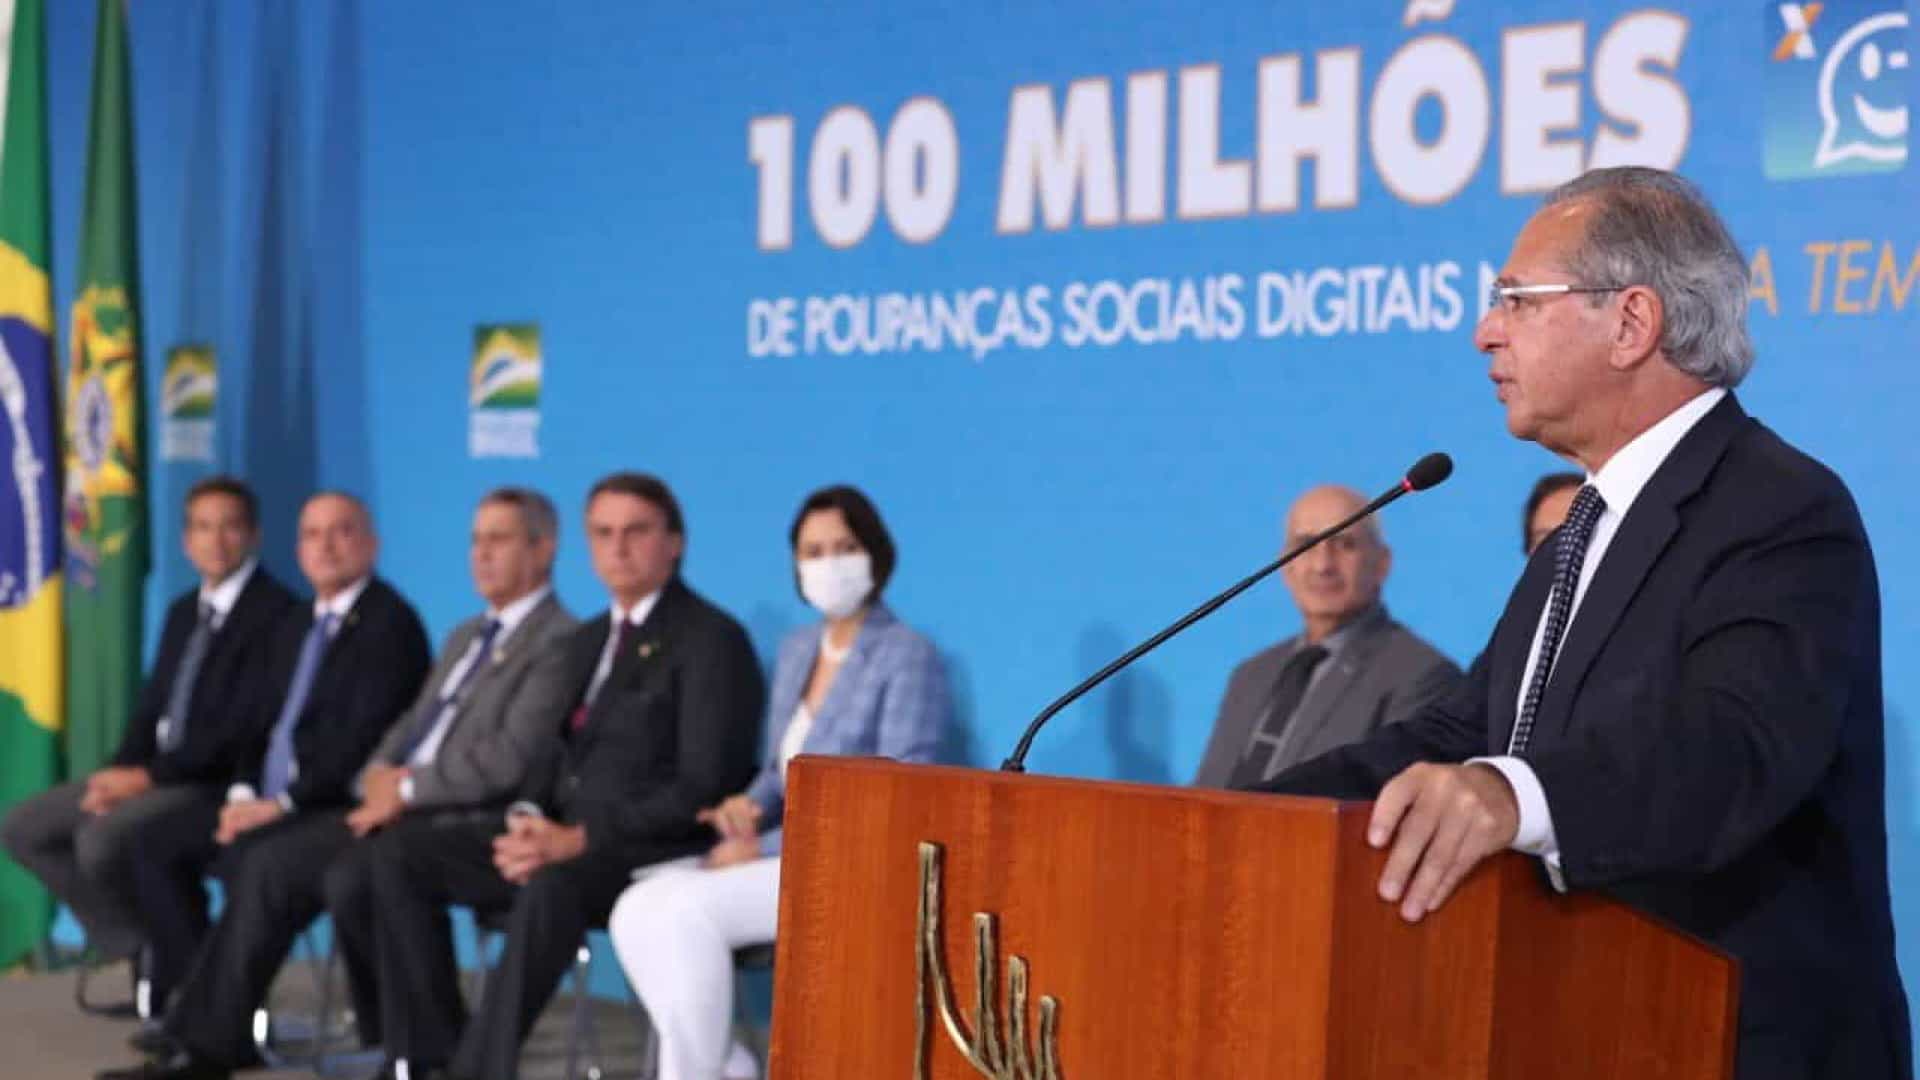 Guedes diz que pandemia da covid-19 está 'cedendo' e economia, voltando